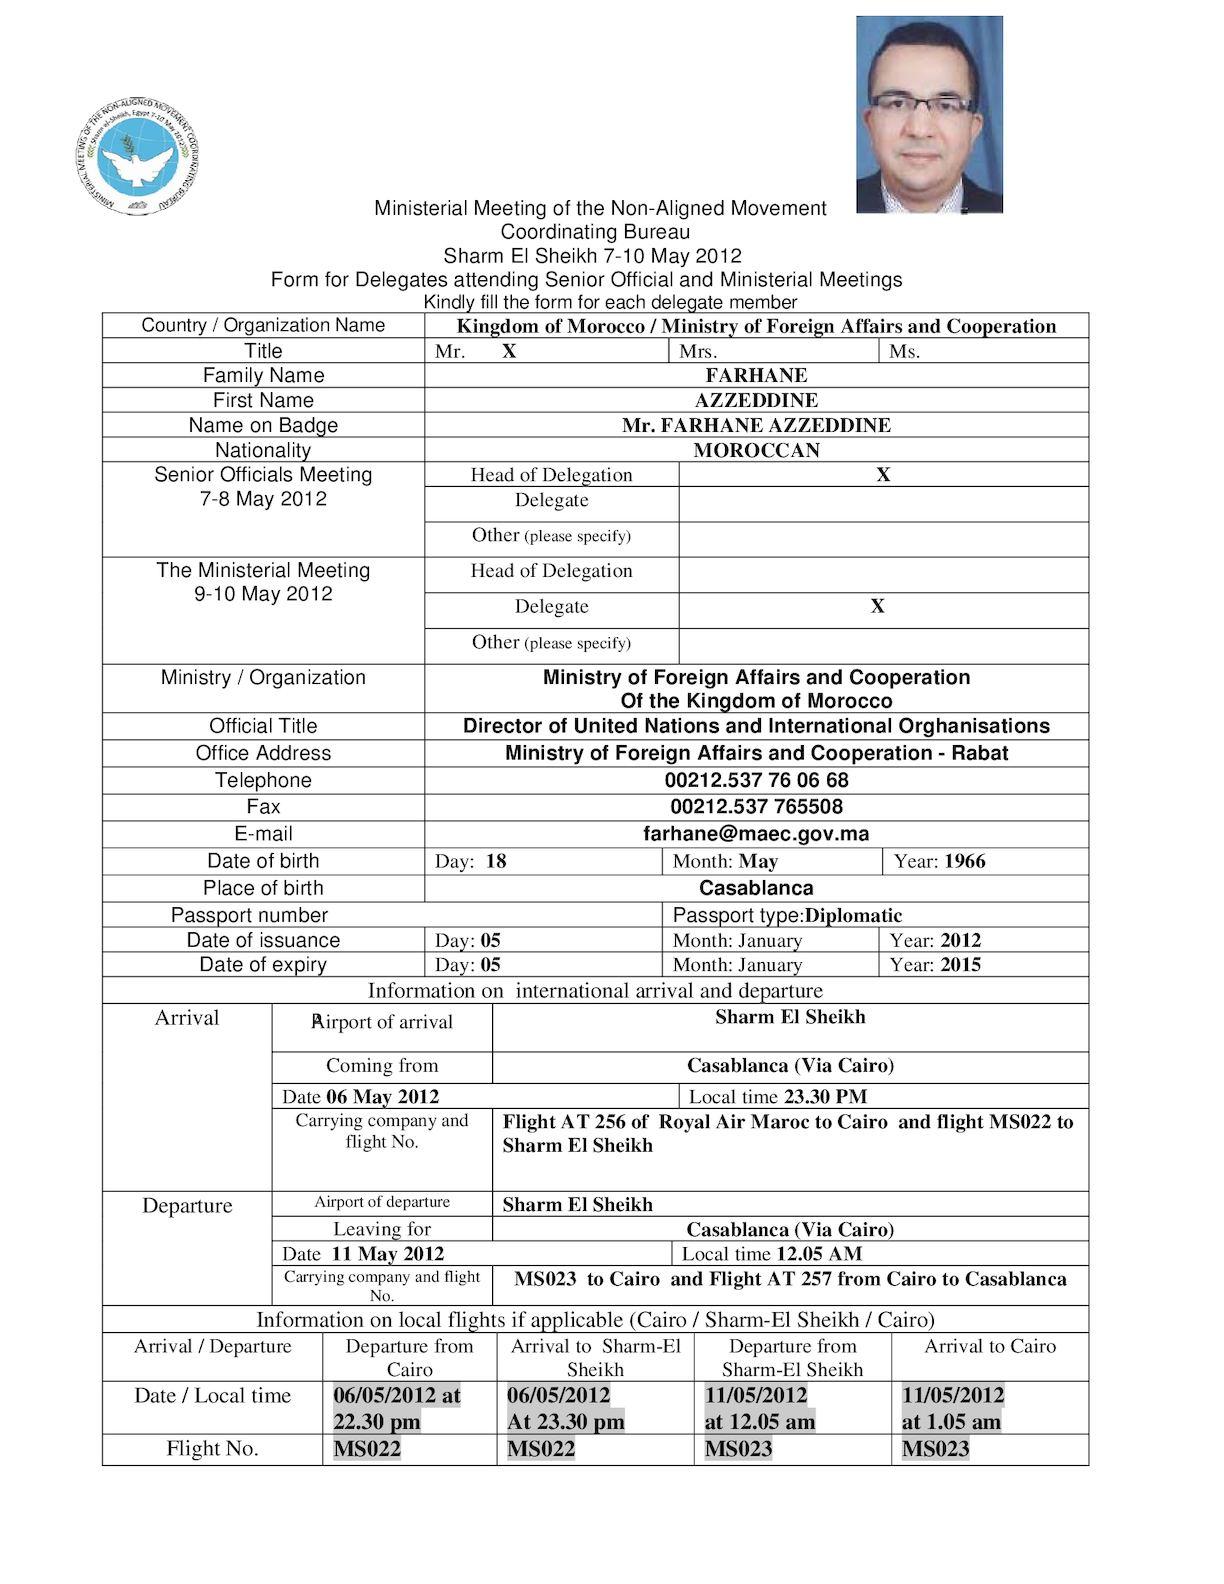 AZZEDDINE FARHANE Registration Form Pdf